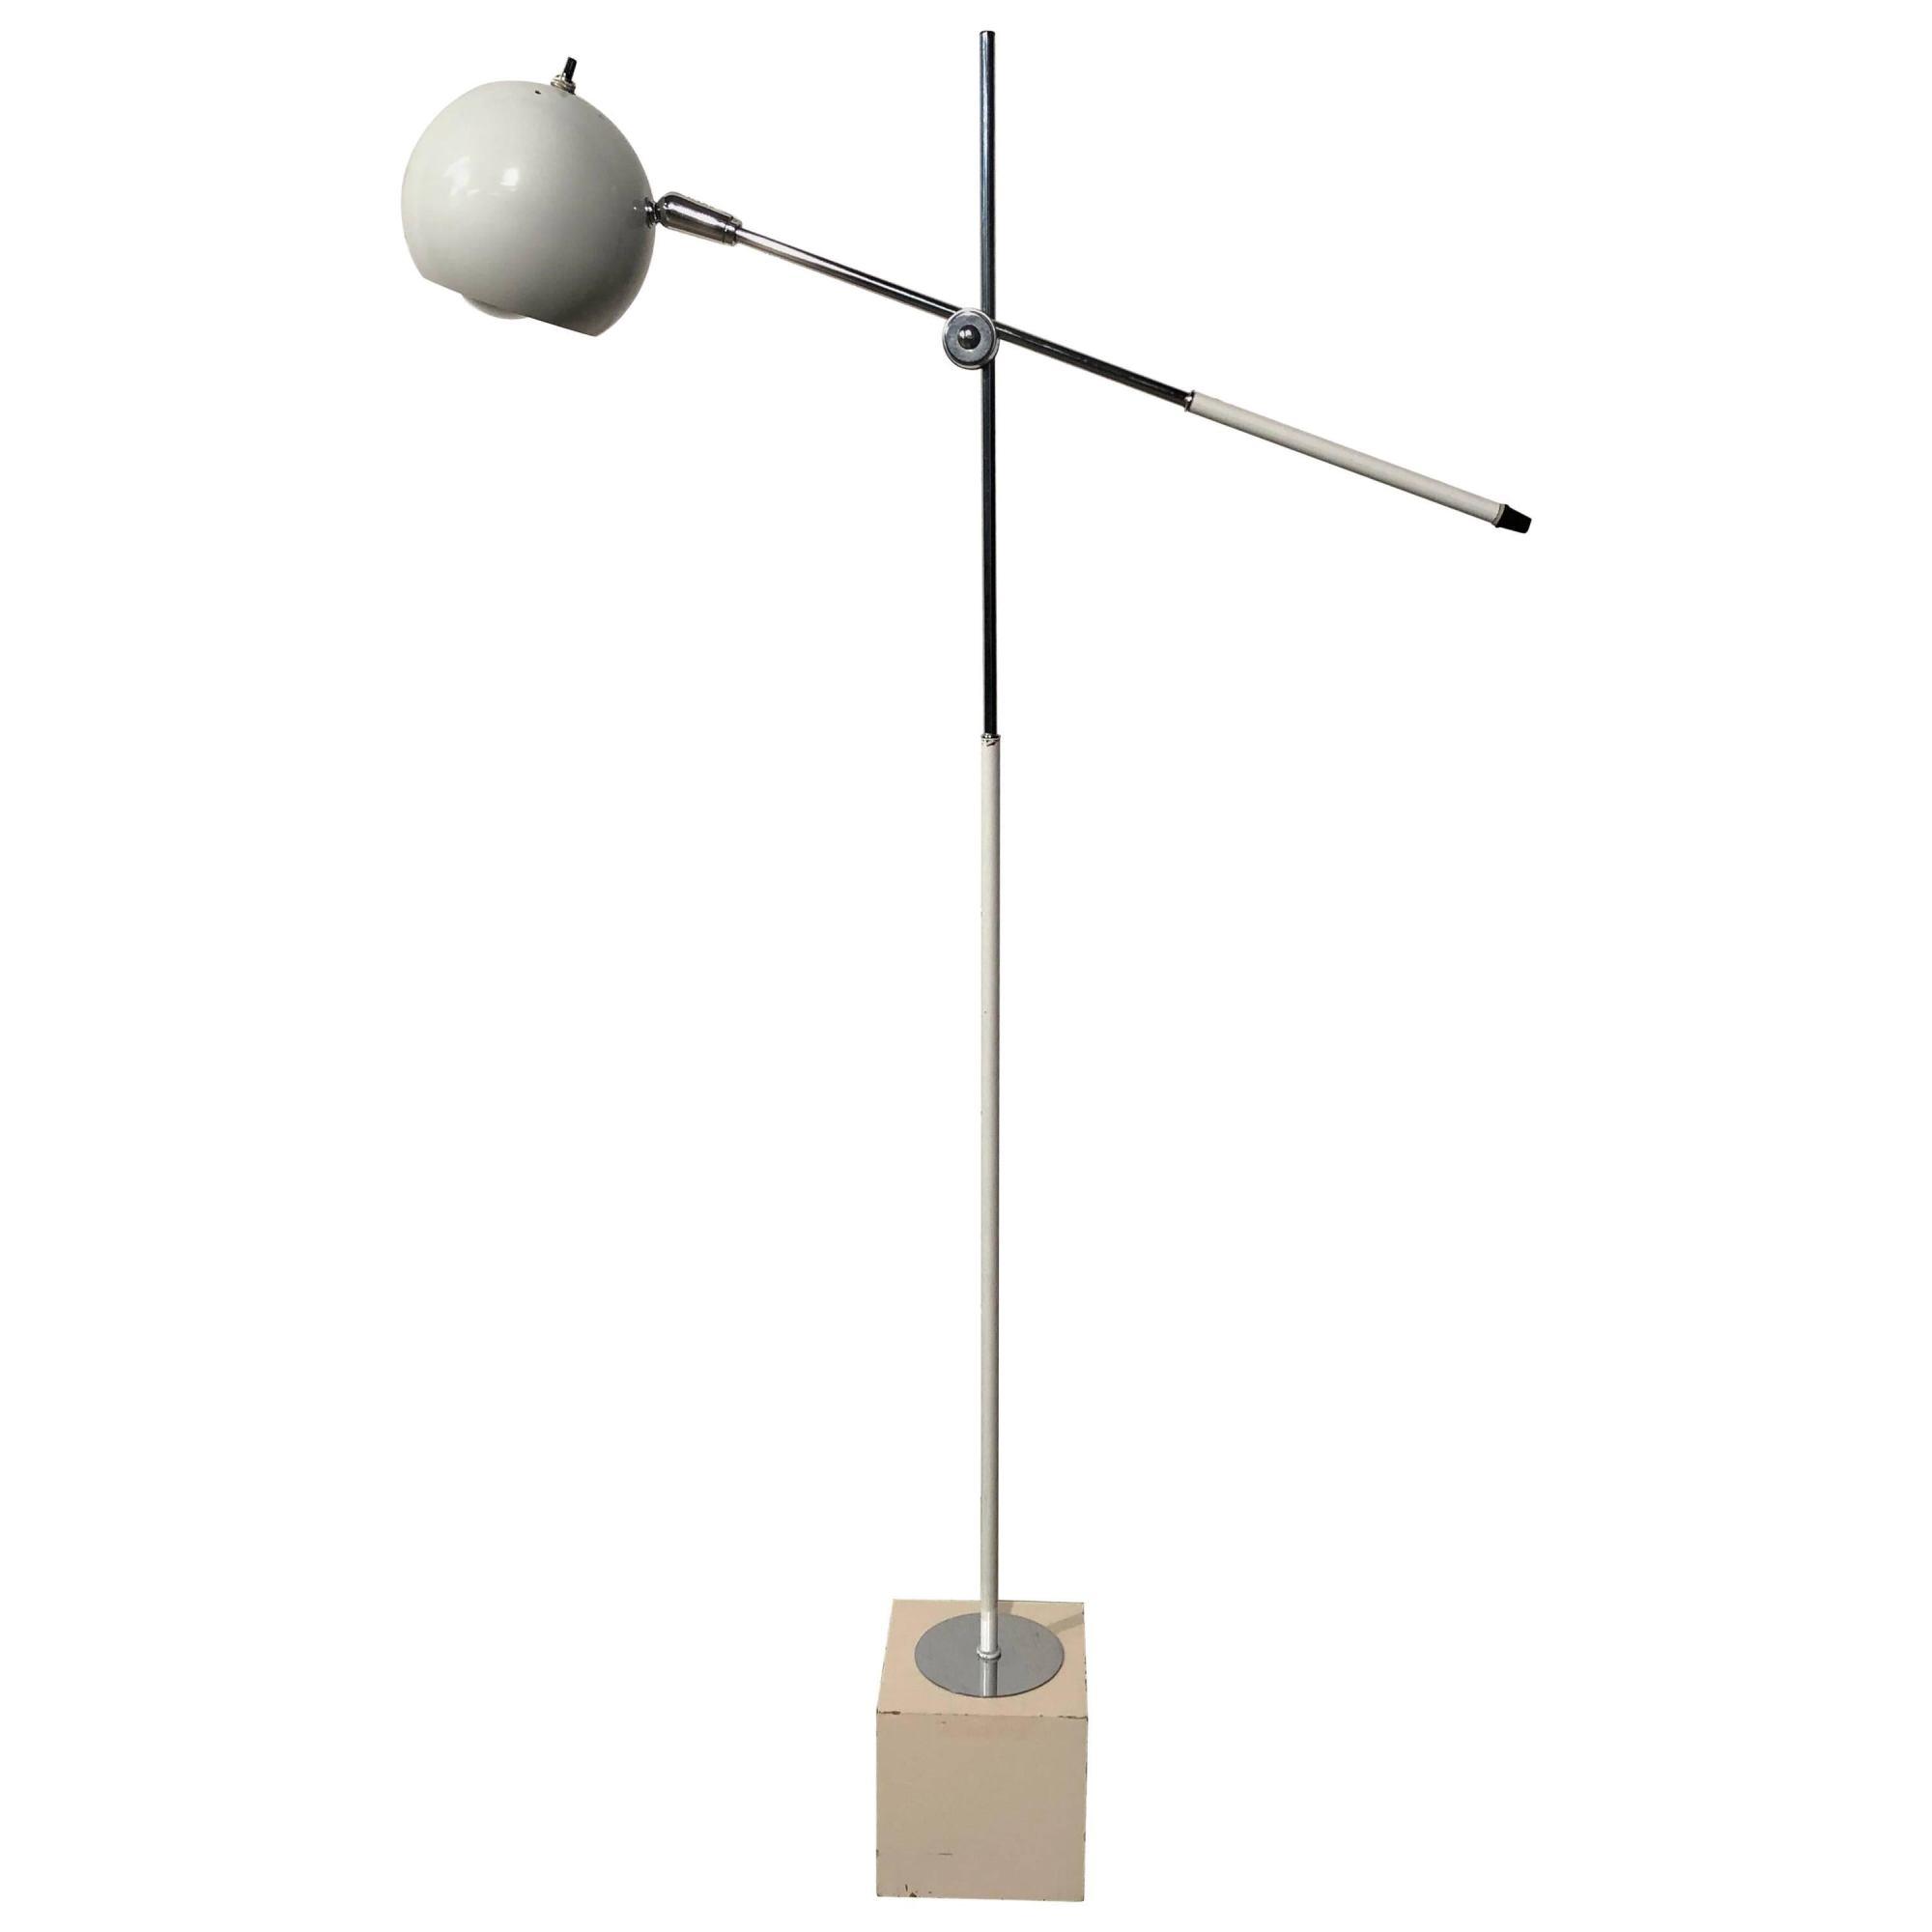 hight resolution of mid century modern fully adjustable white floor lamp by robert sonneman at 1stdibs